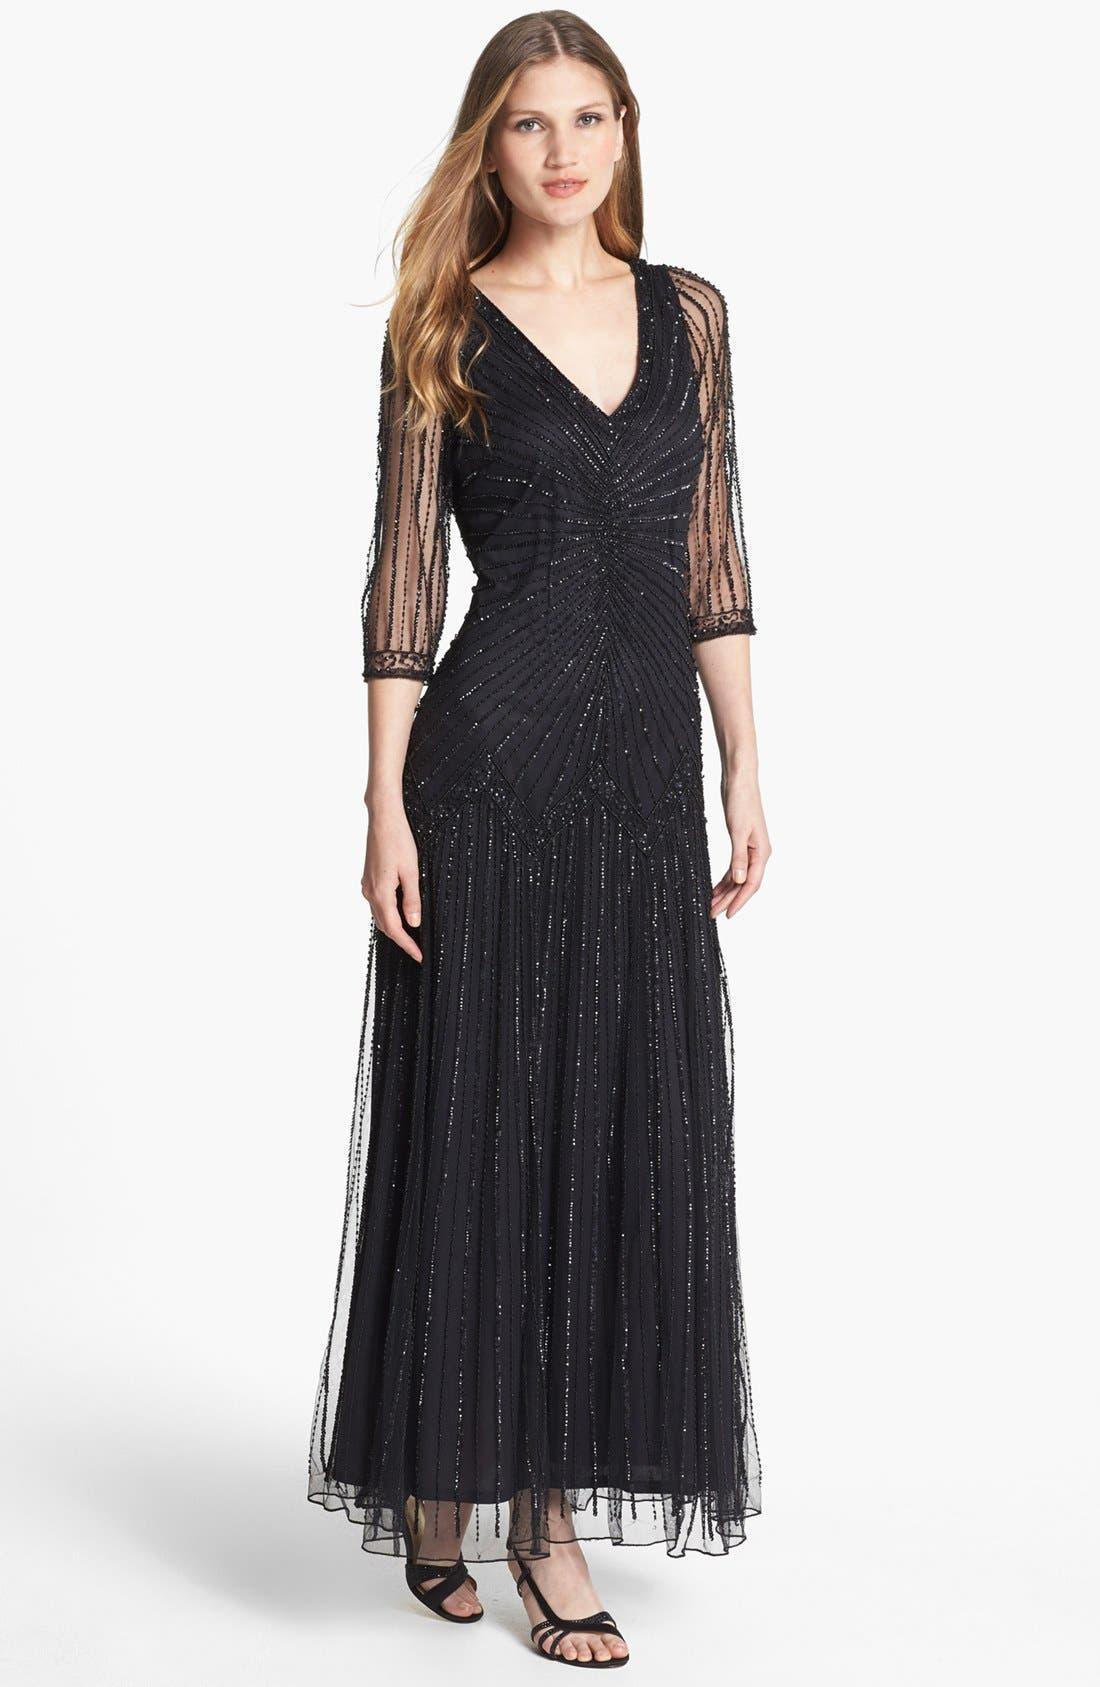 Main Image - Pisarro Nights Embellished Illusion Sleeve Mesh Gown